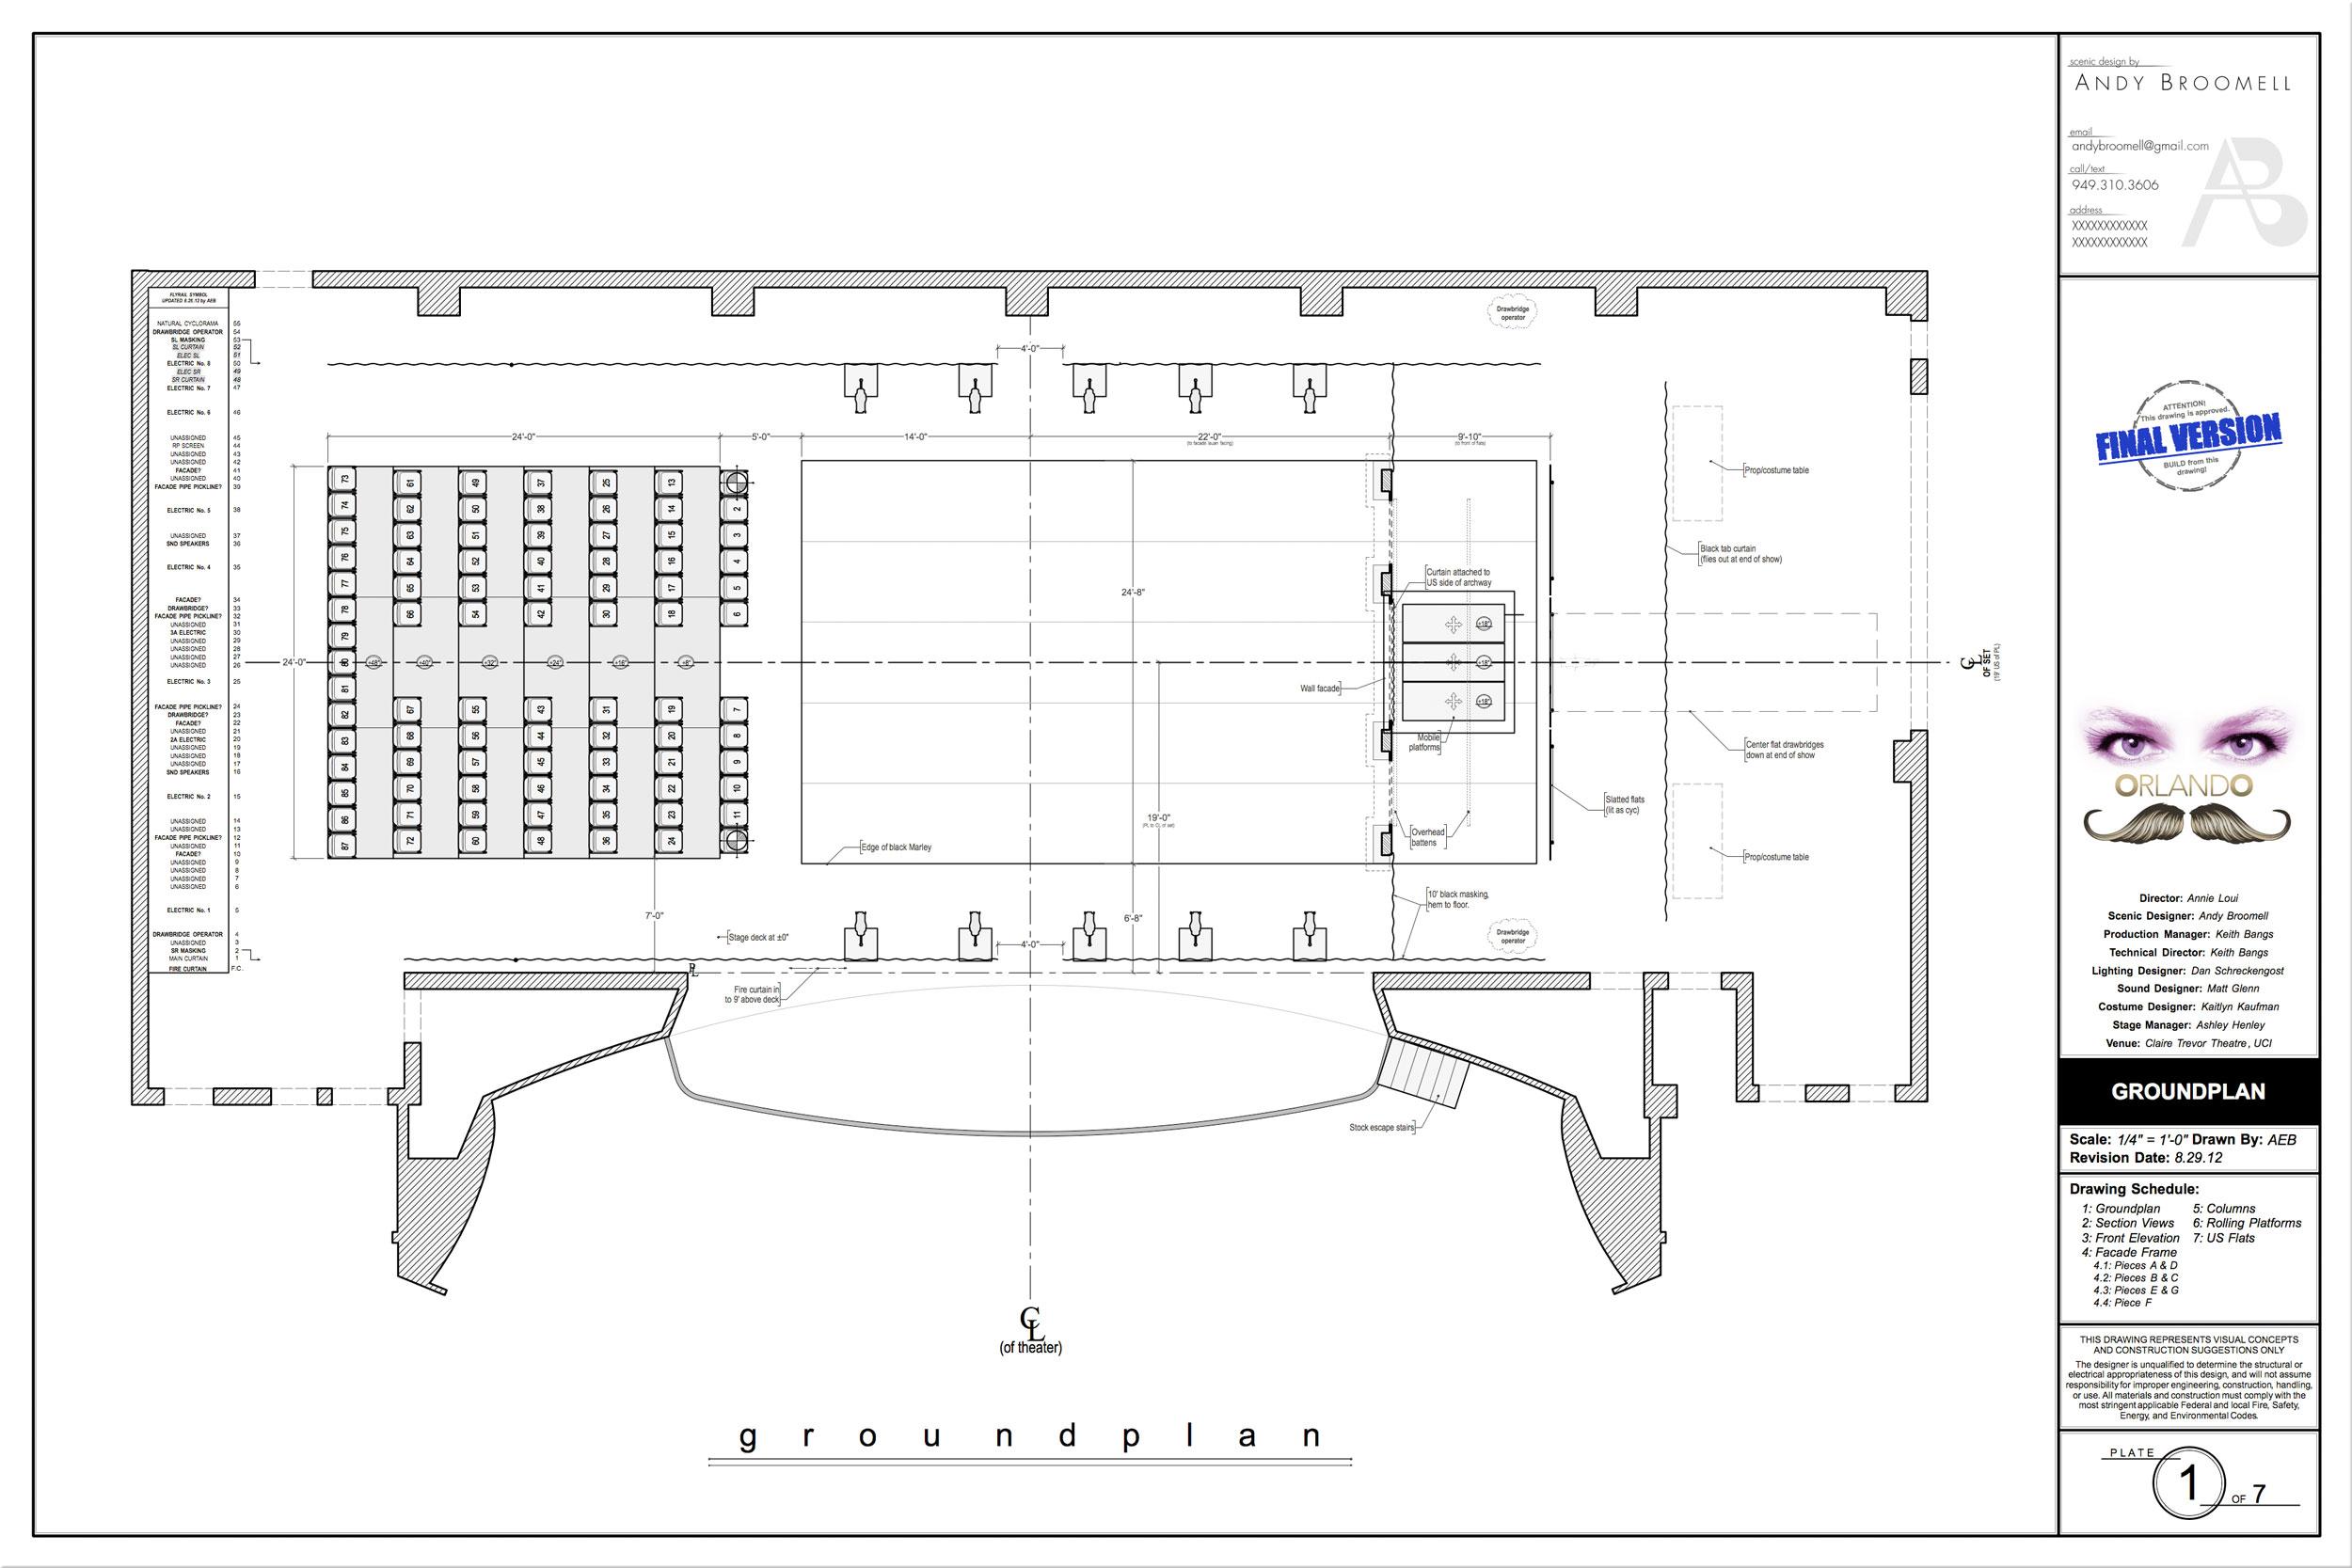 andy-broomell-scenic-design-drafting-orlando-1.jpg